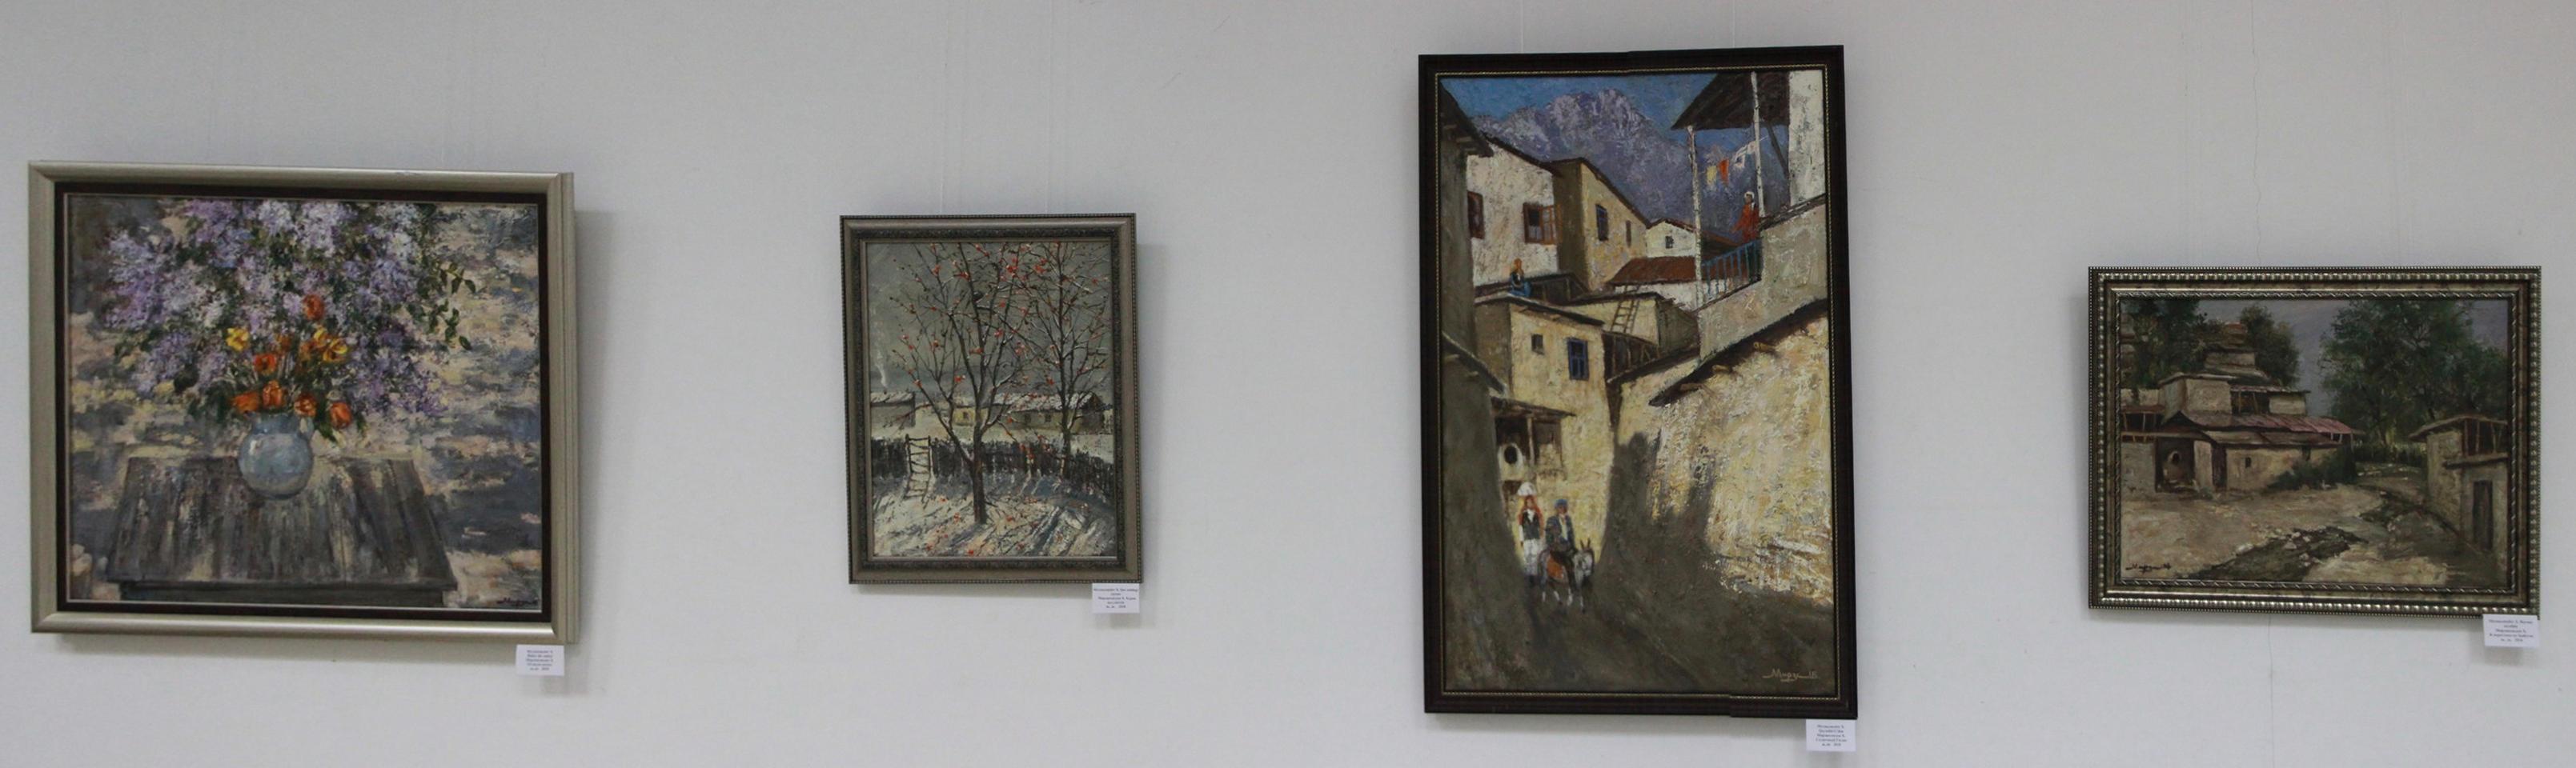 Хаким Мирзахмедов. Экспозиция картин.